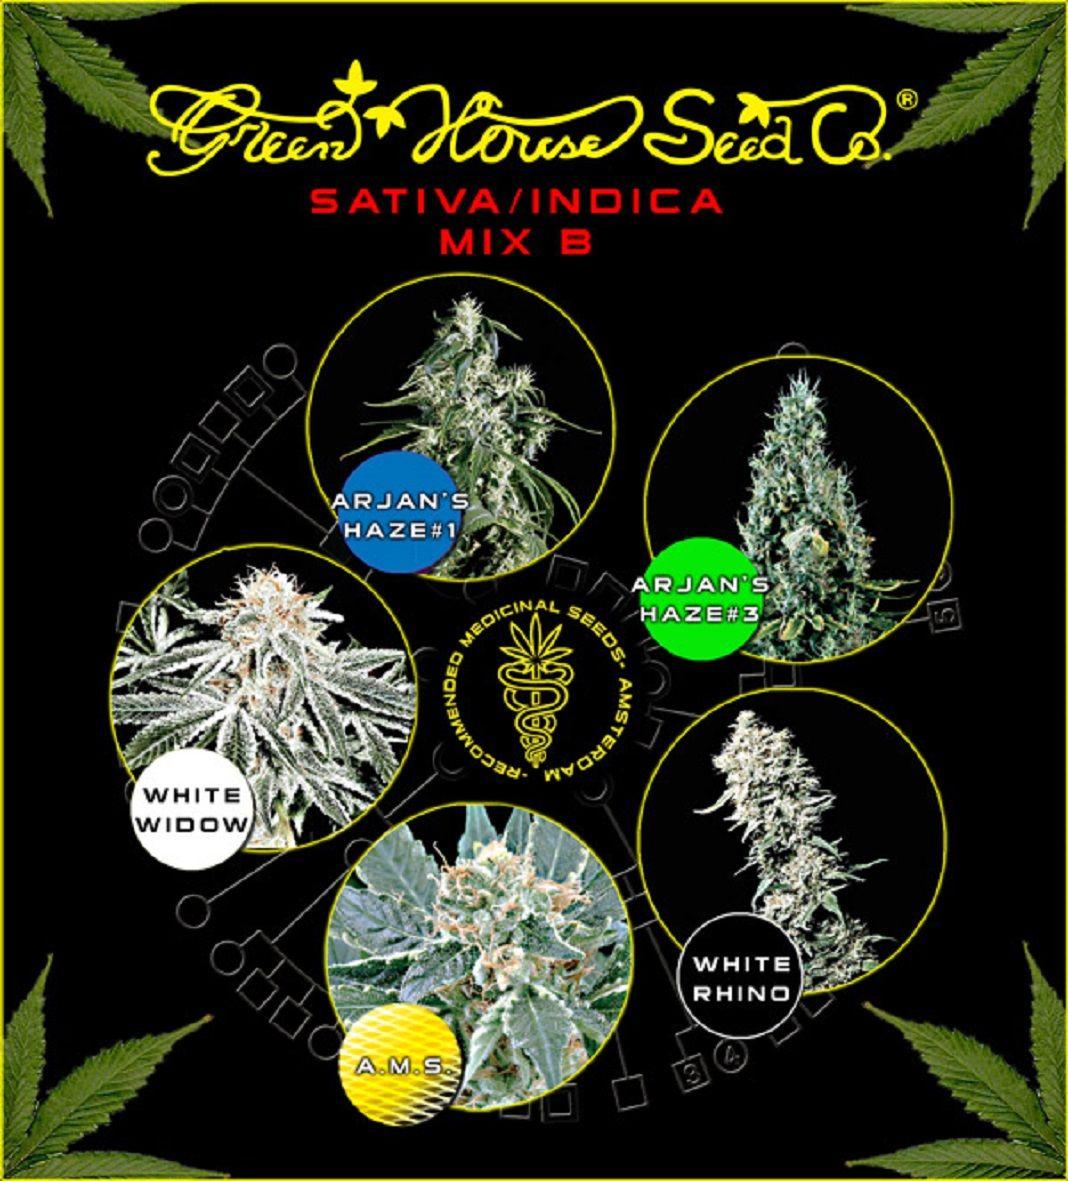 Green House Seeds Sativa/Indica Mix B